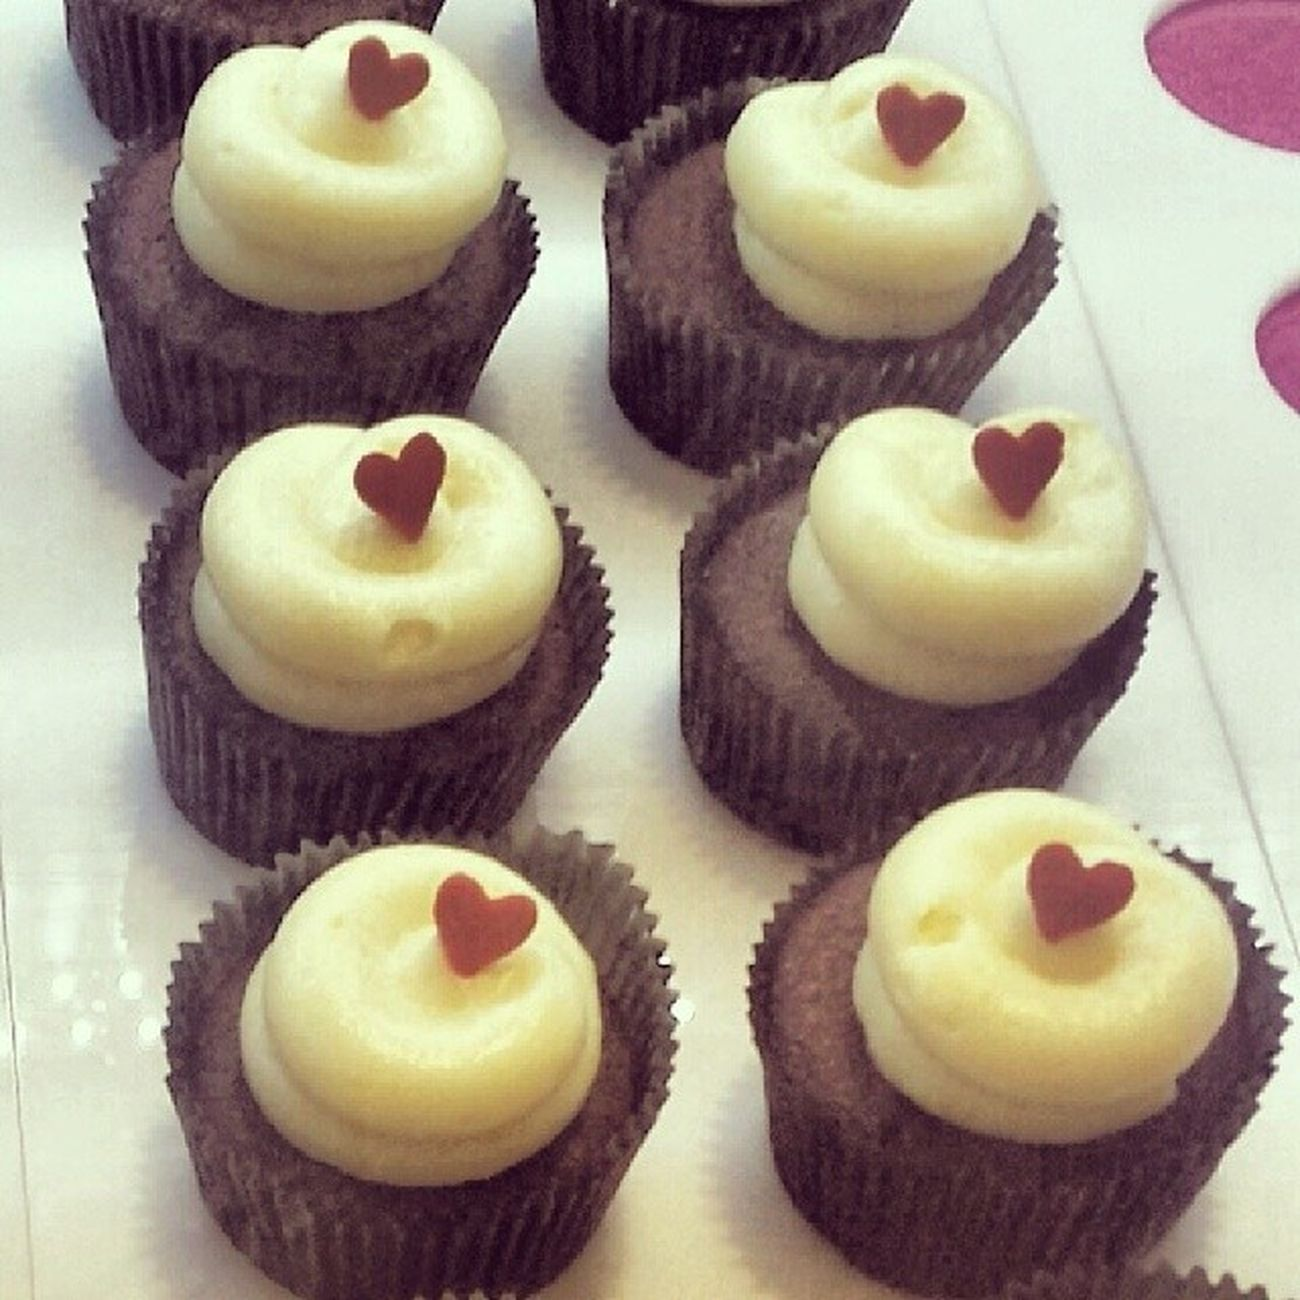 Cupcakes with love Twelvecupcakes @centurycitymallph